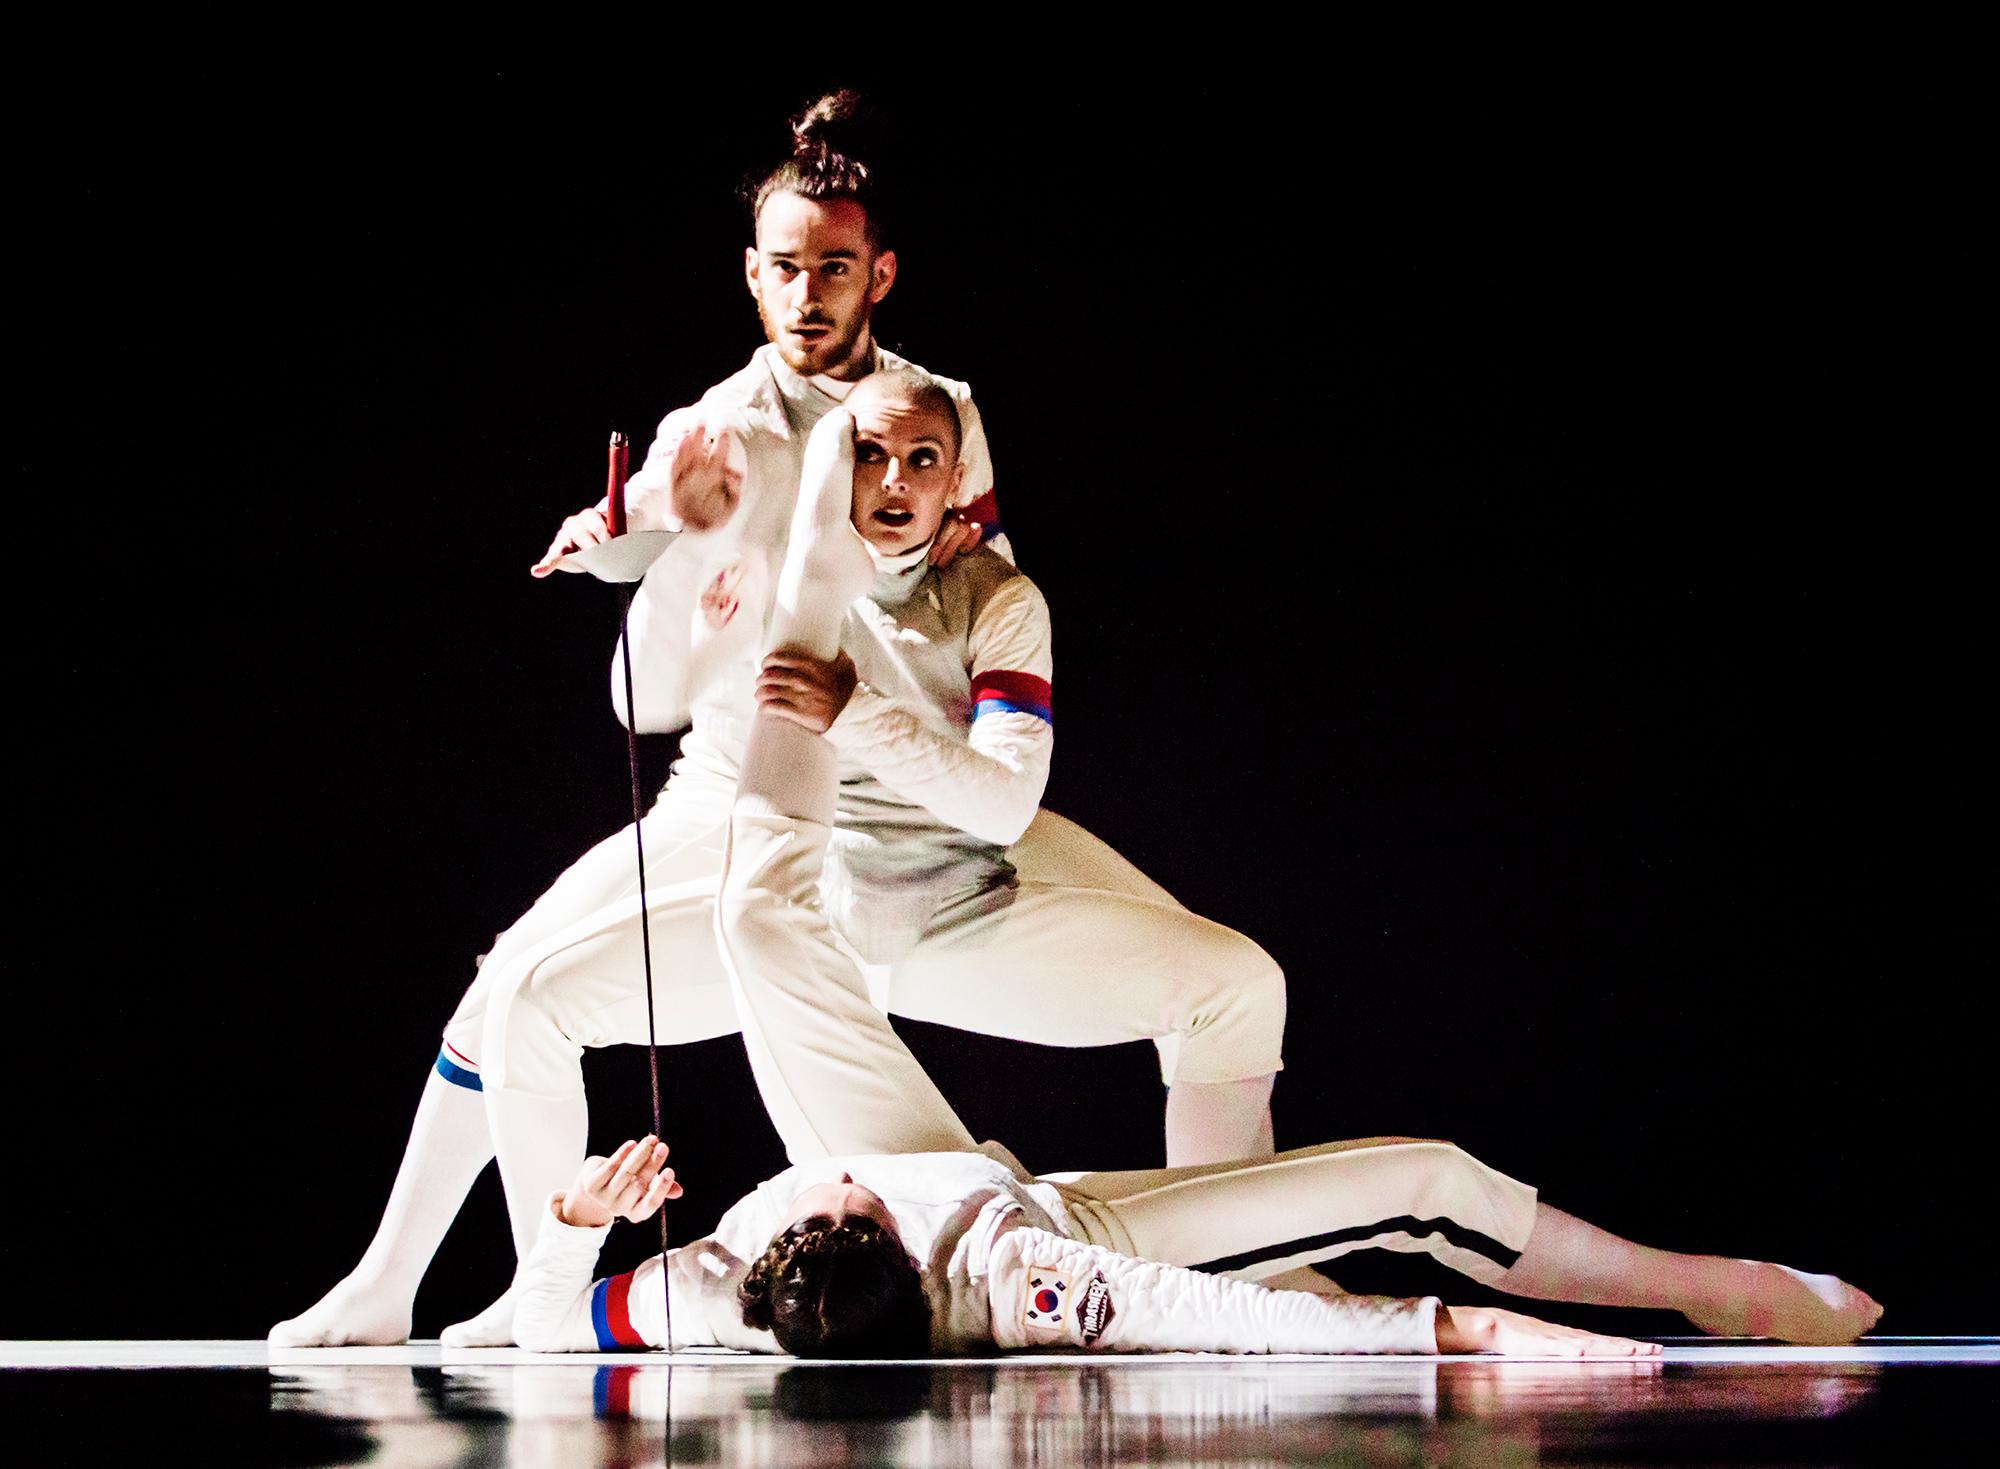 TWOOLS - Scapino Ballet Rotterdam & Marcos Morau (in beeld Bonnie Doets, Maya Roest en Dario Minoia)